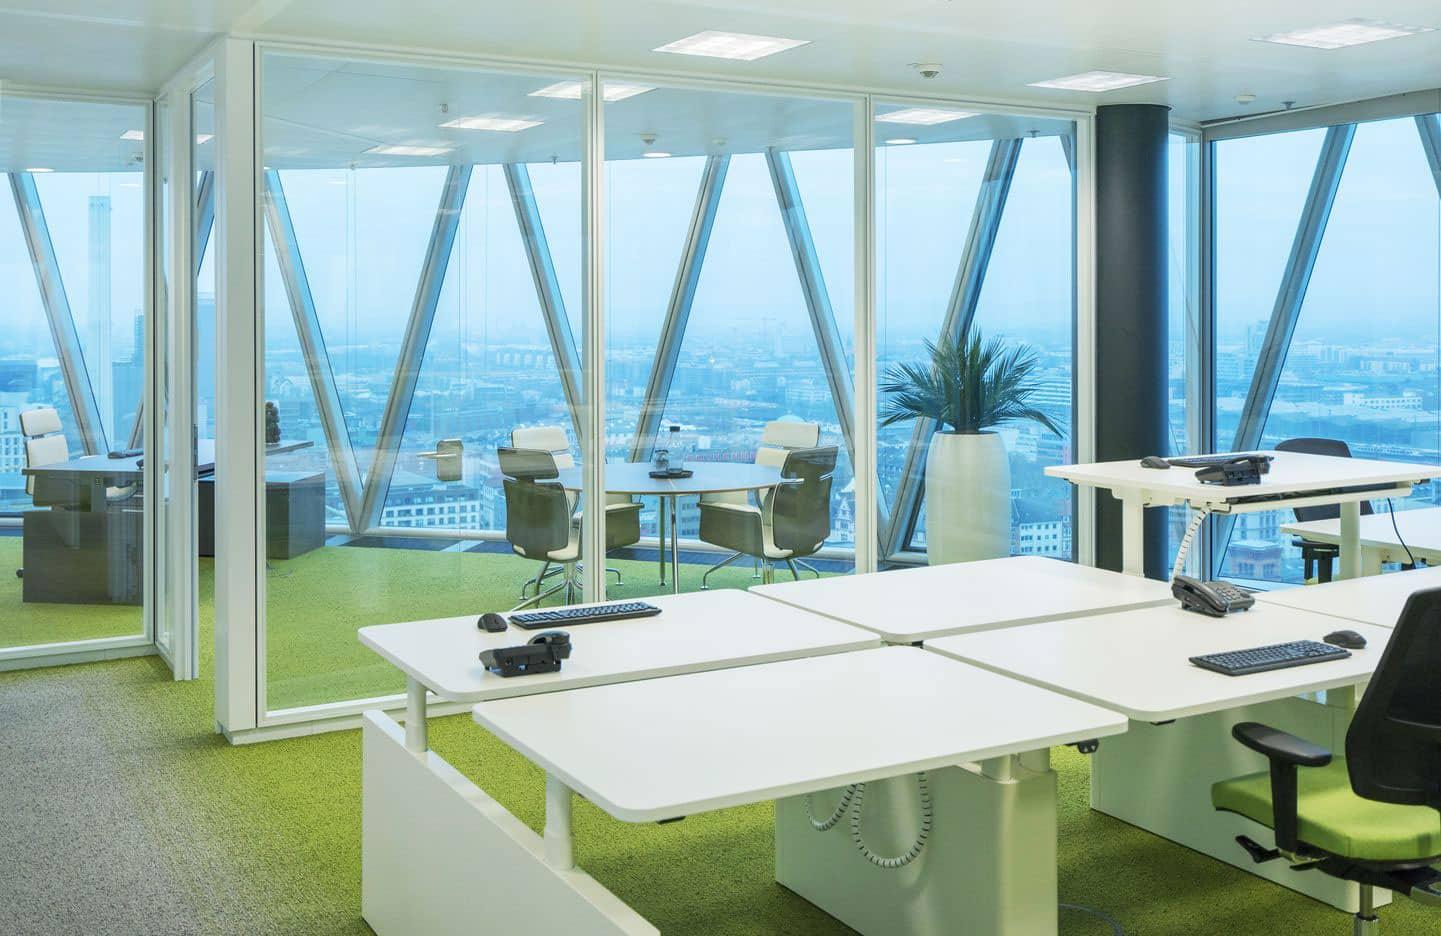 dutch office furniture manufacturer vepa to expand german activities officerepublic. Black Bedroom Furniture Sets. Home Design Ideas